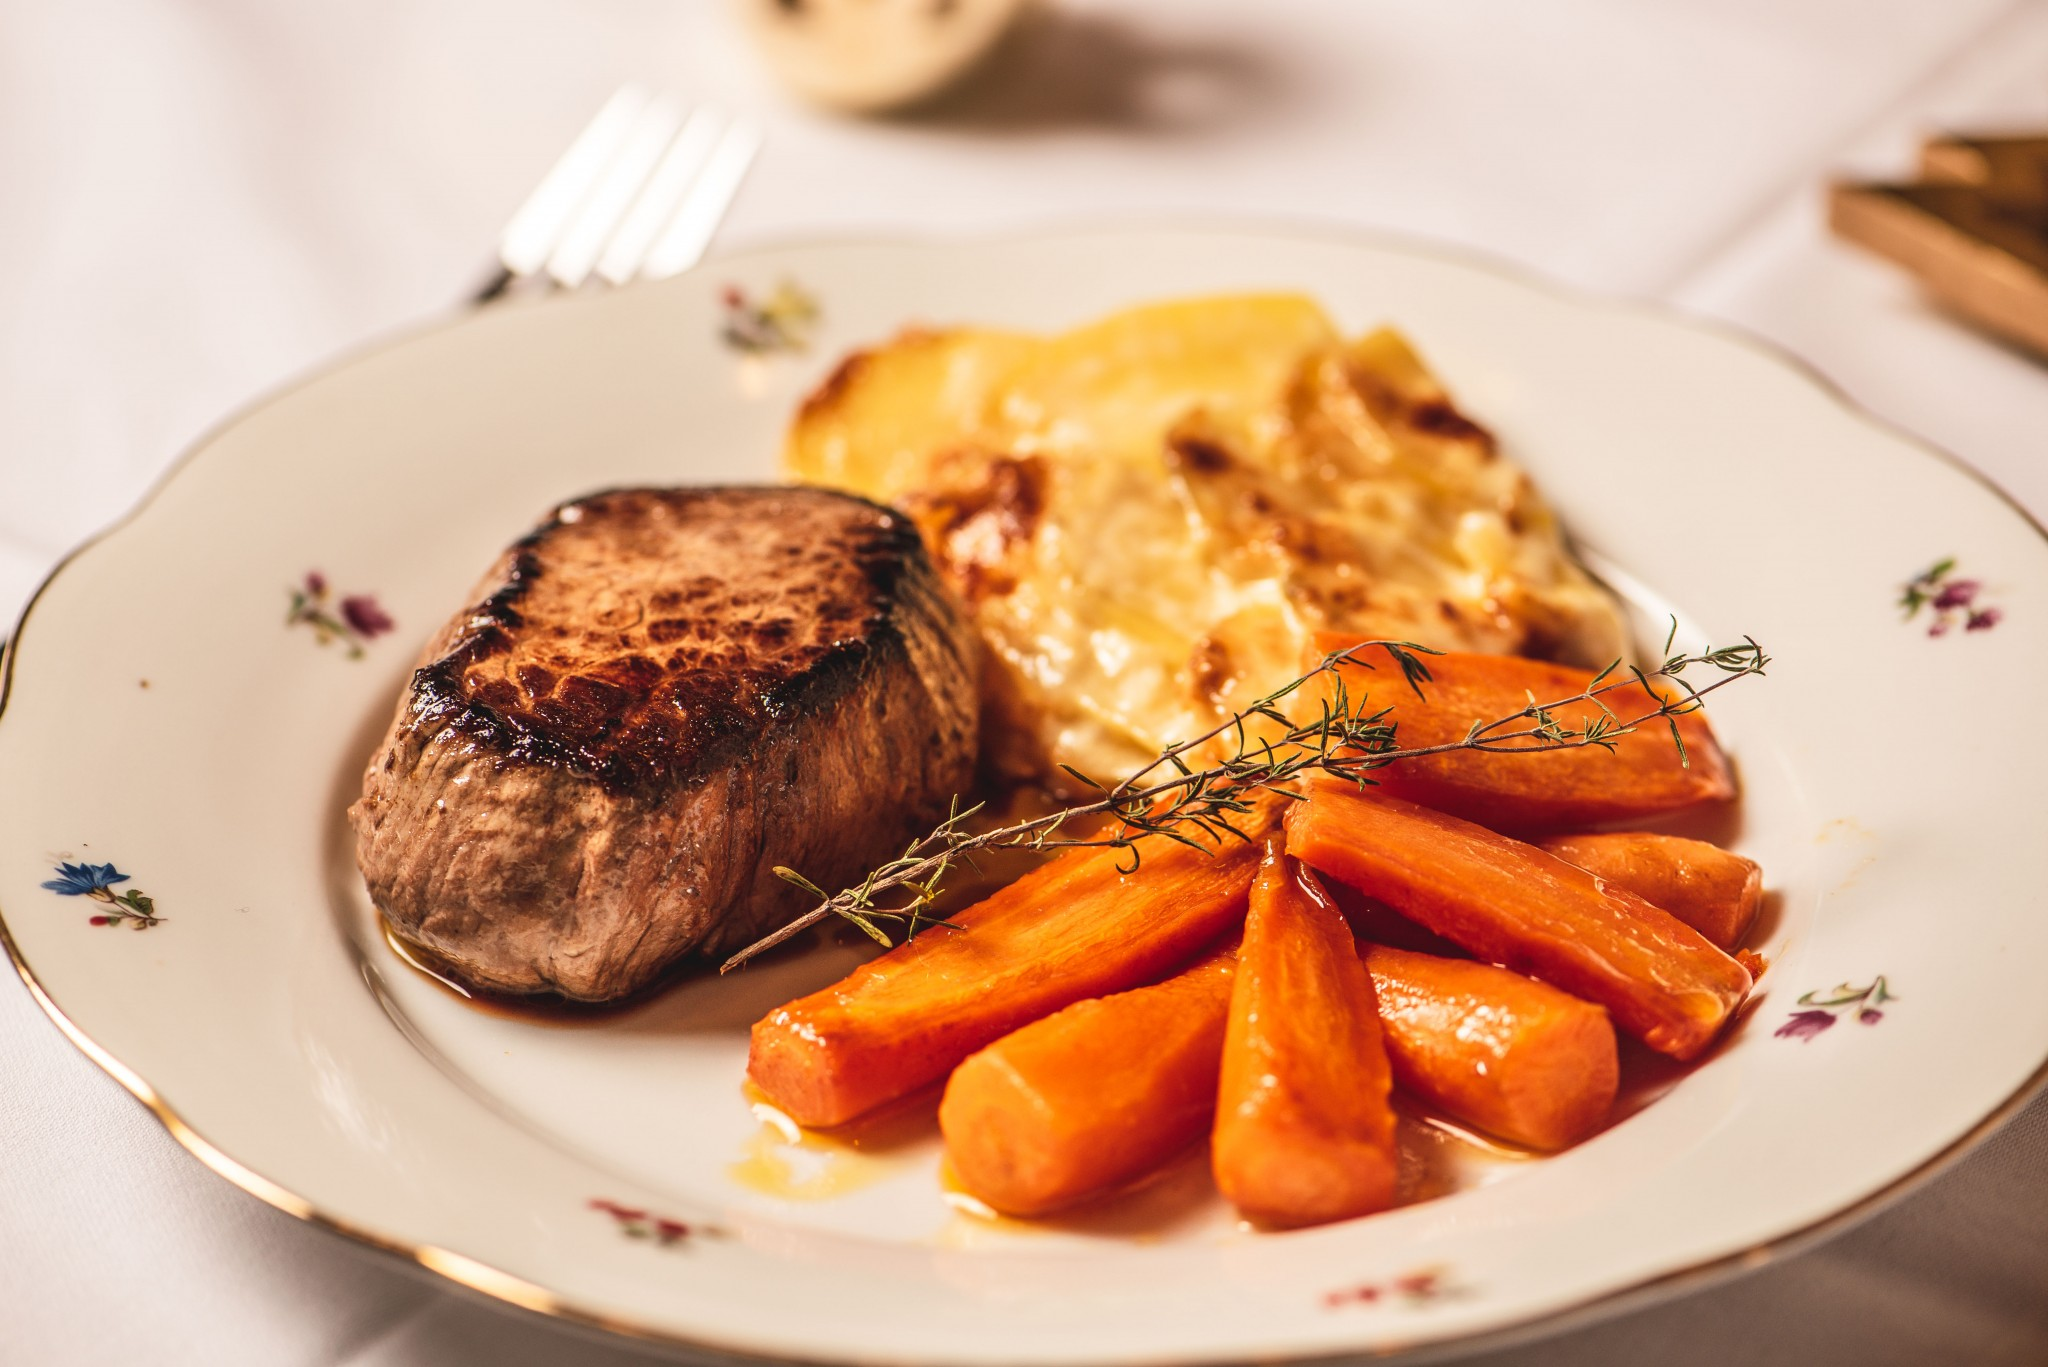 Rindsfilet mit Cognacsauce & Kartoffelgratin